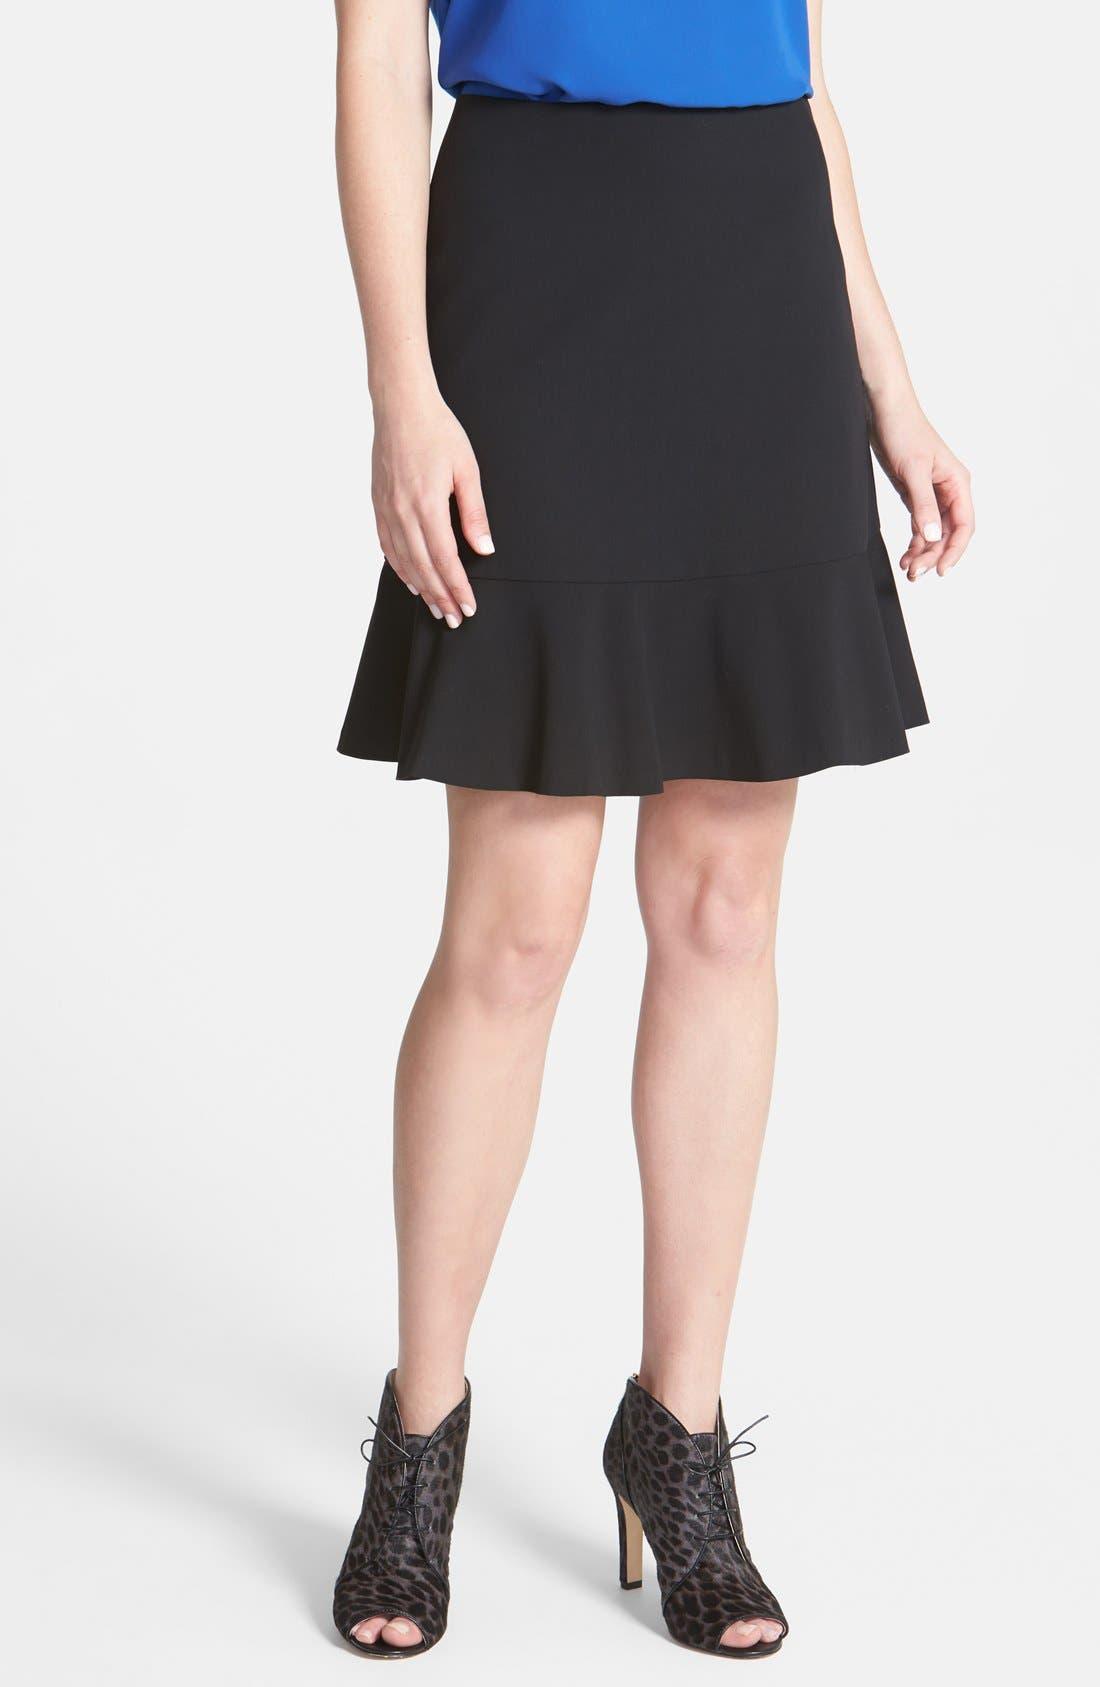 Alternate Image 1 Selected - Vince Camuto Ruffle Hem Skirt (Regular & Petite)